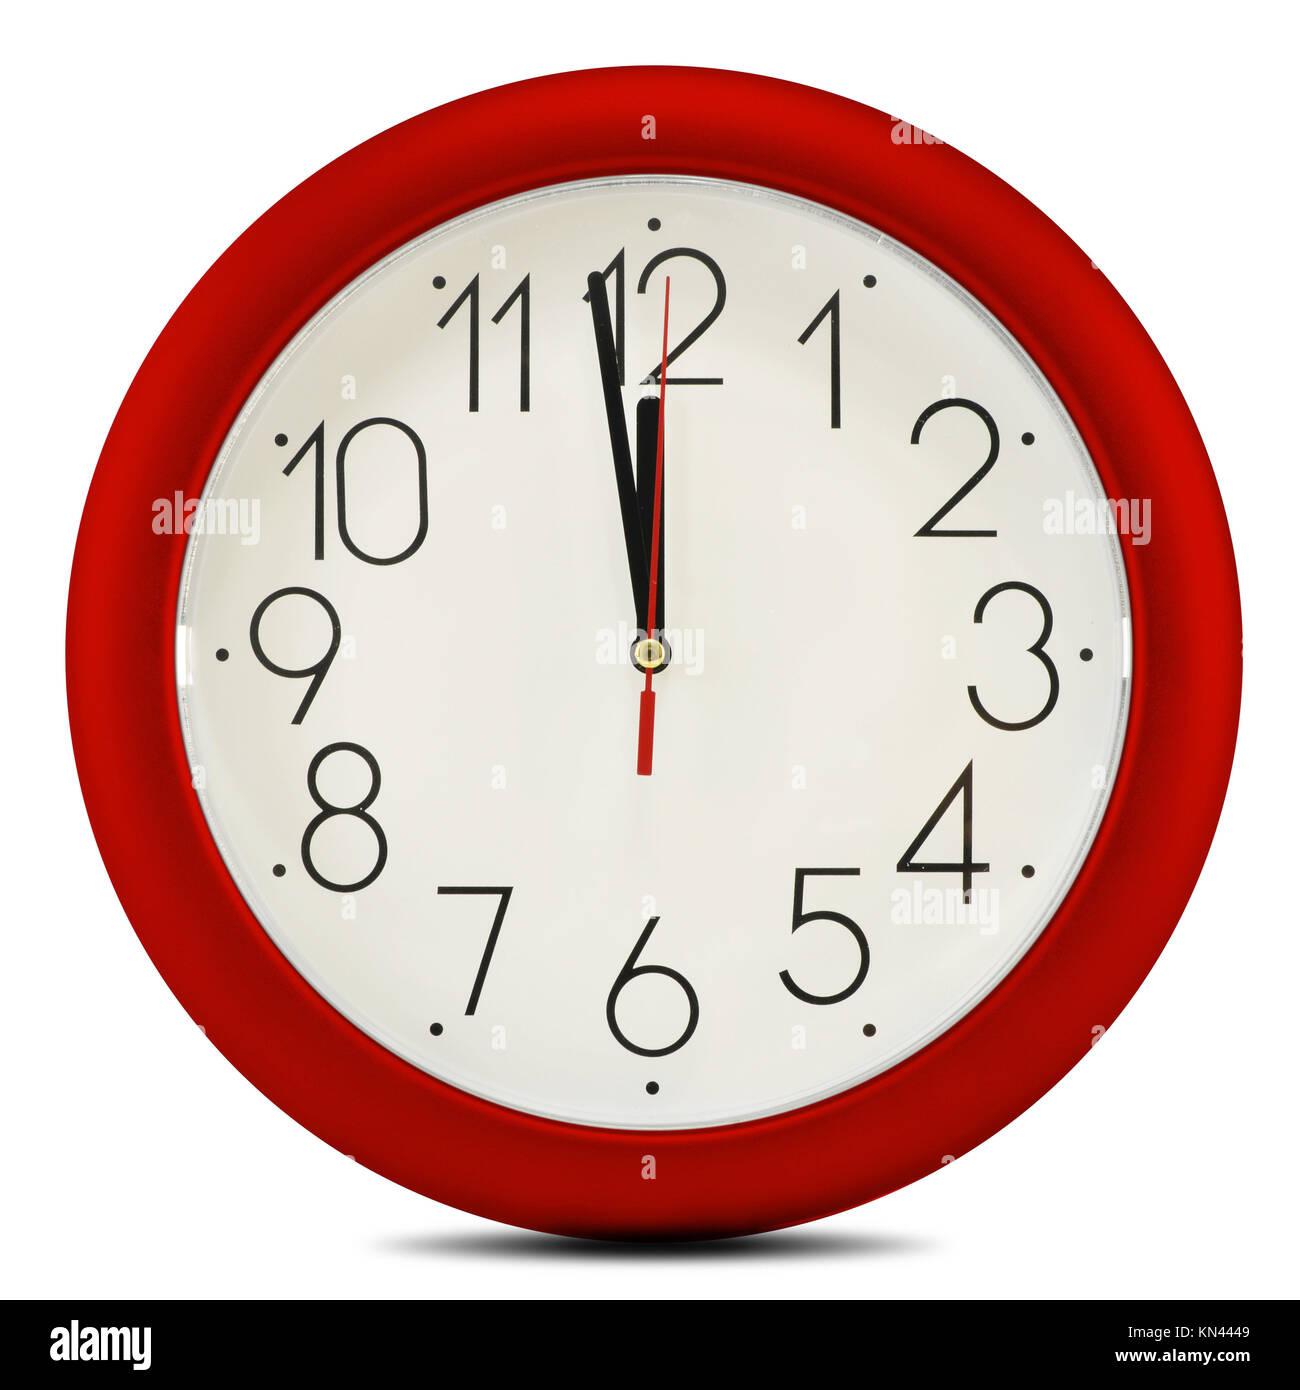 Wall clock isolated on white background. Twelve o'clock. - Stock Image